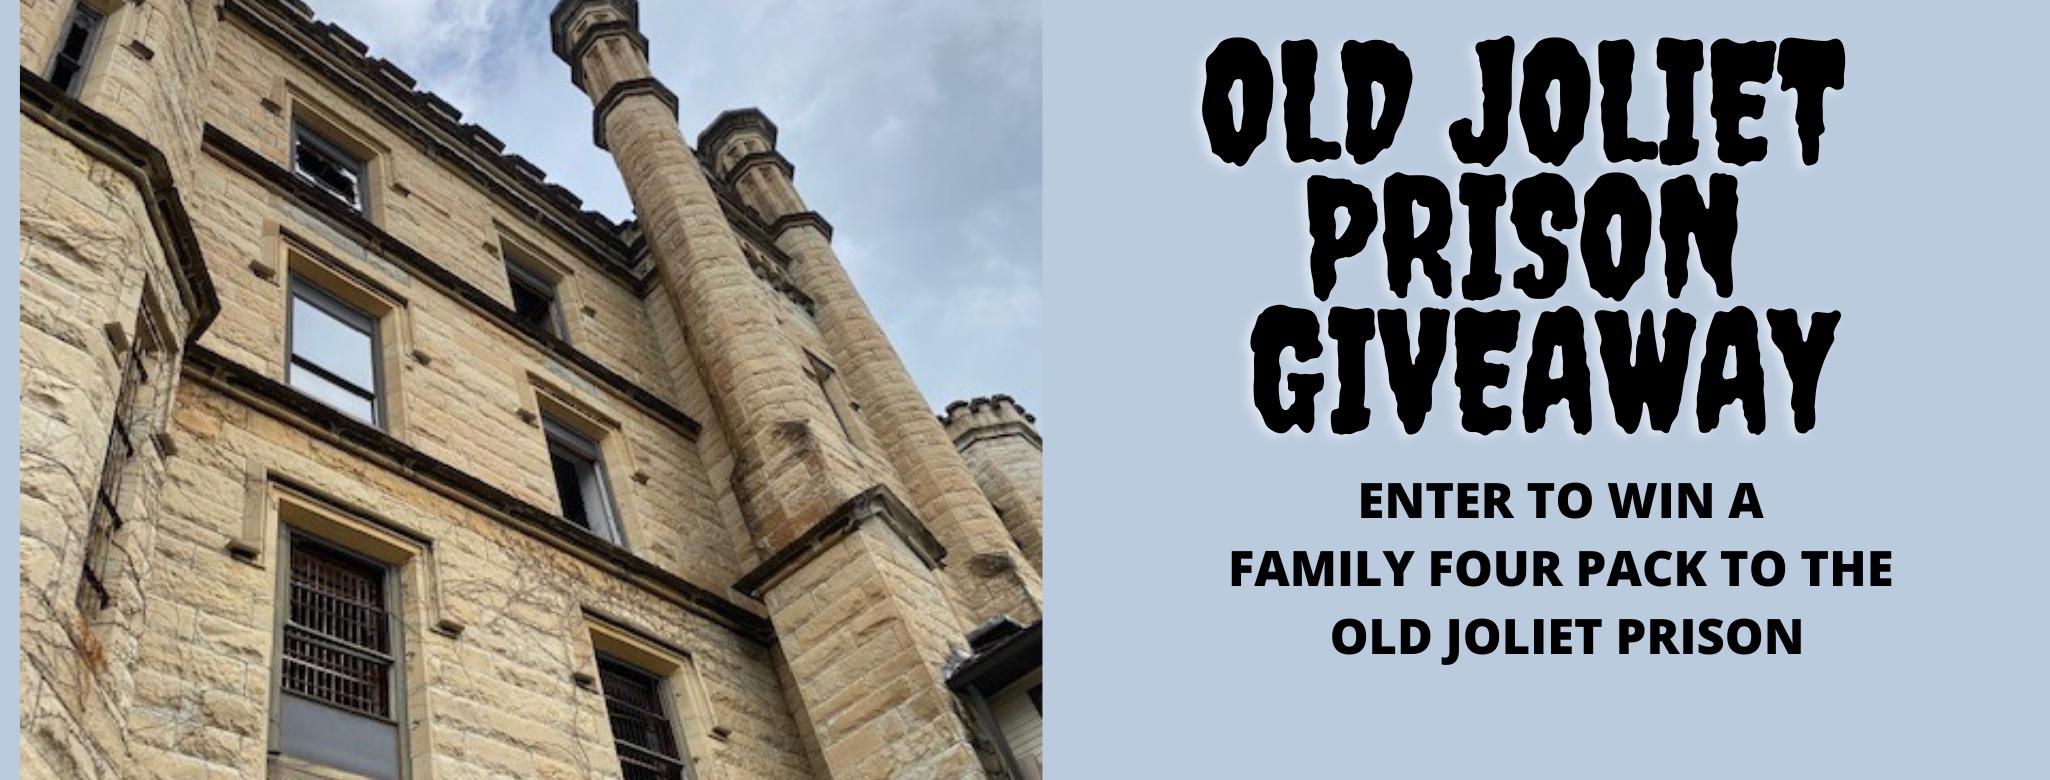 Old Joliet Prison Giveaway